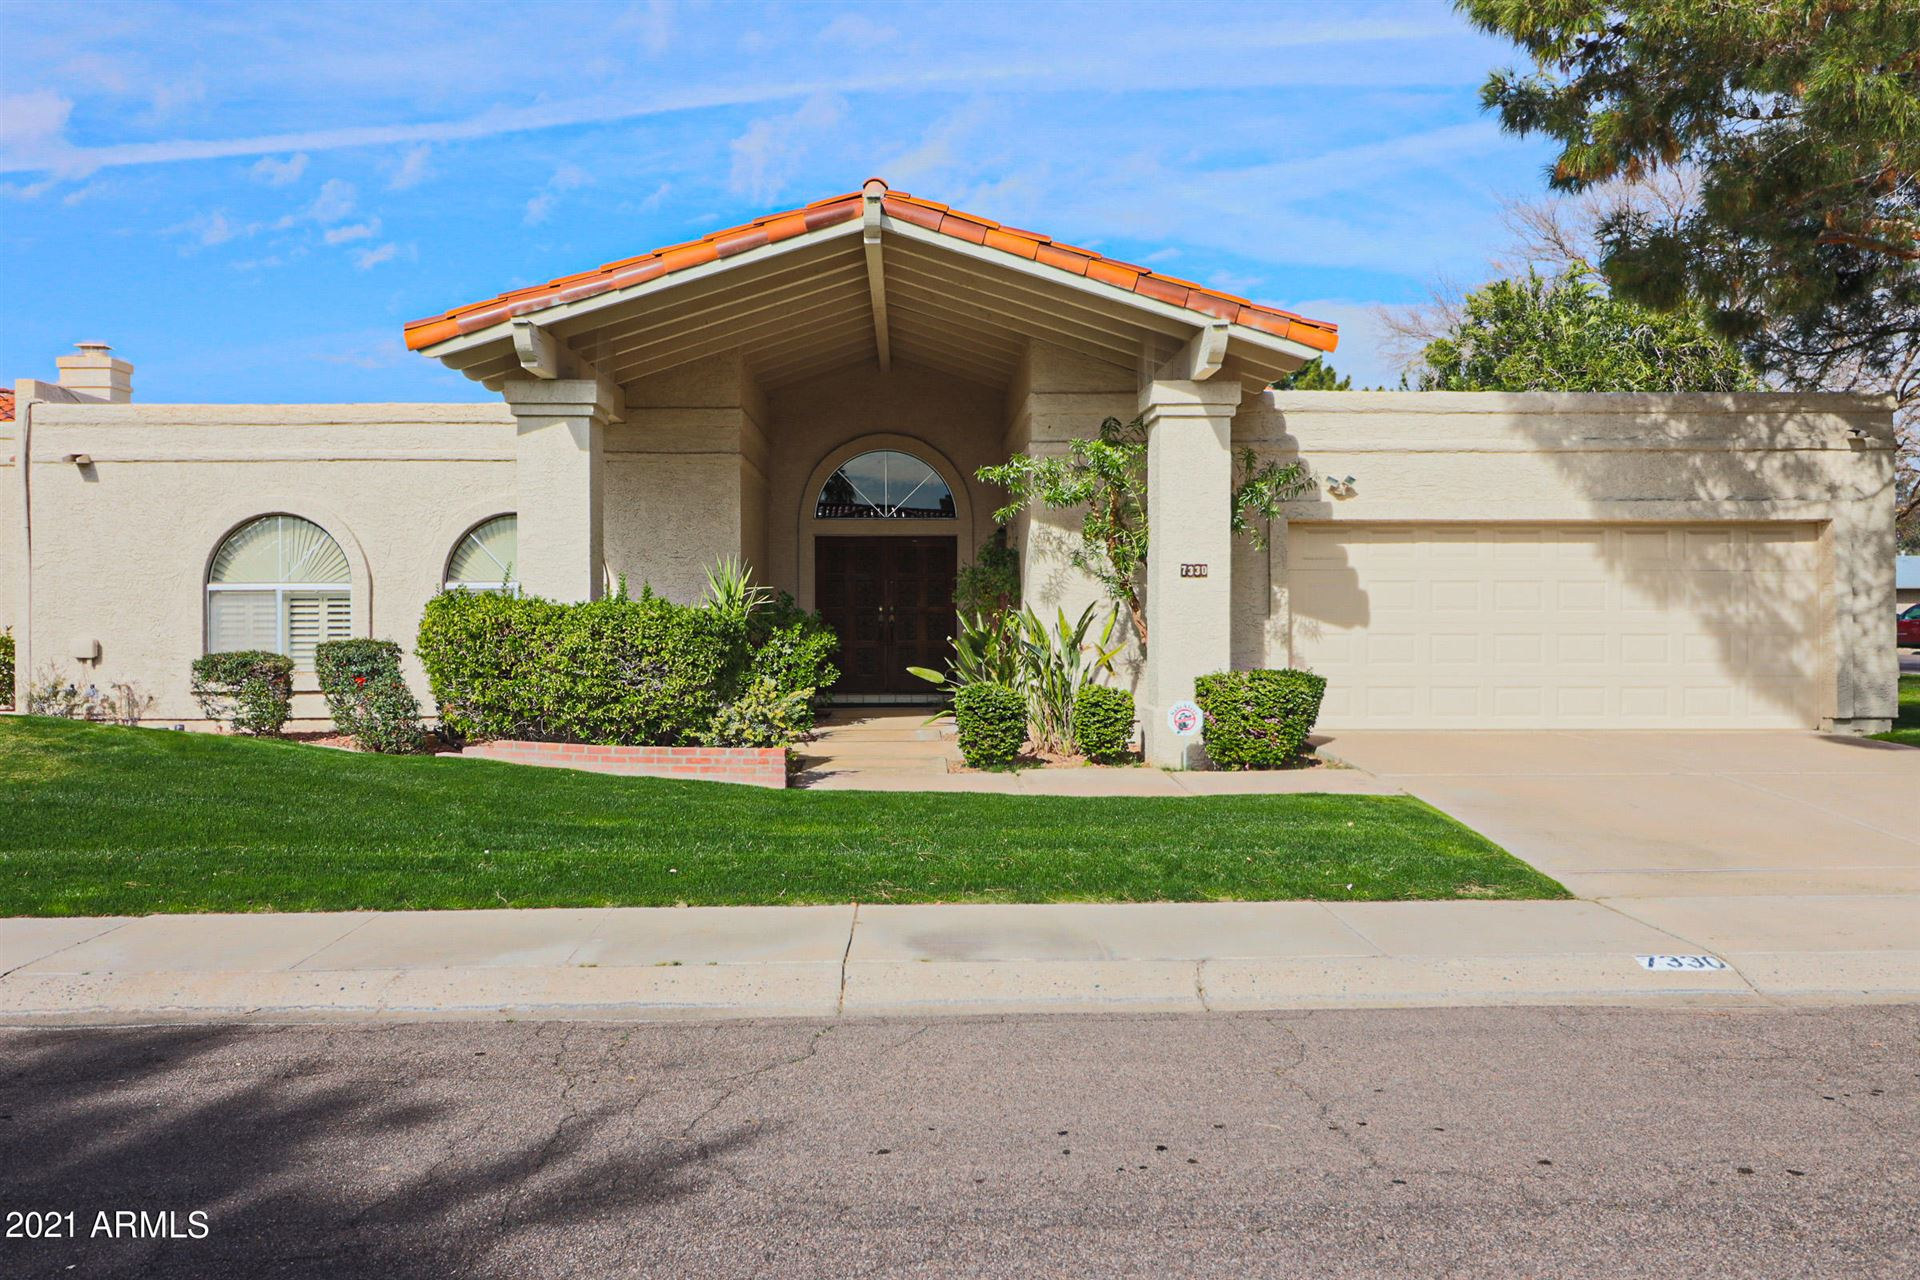 Photo of 7330 E LAS PALMARITAS Drive, Scottsdale, AZ 85258 (MLS # 6249804)